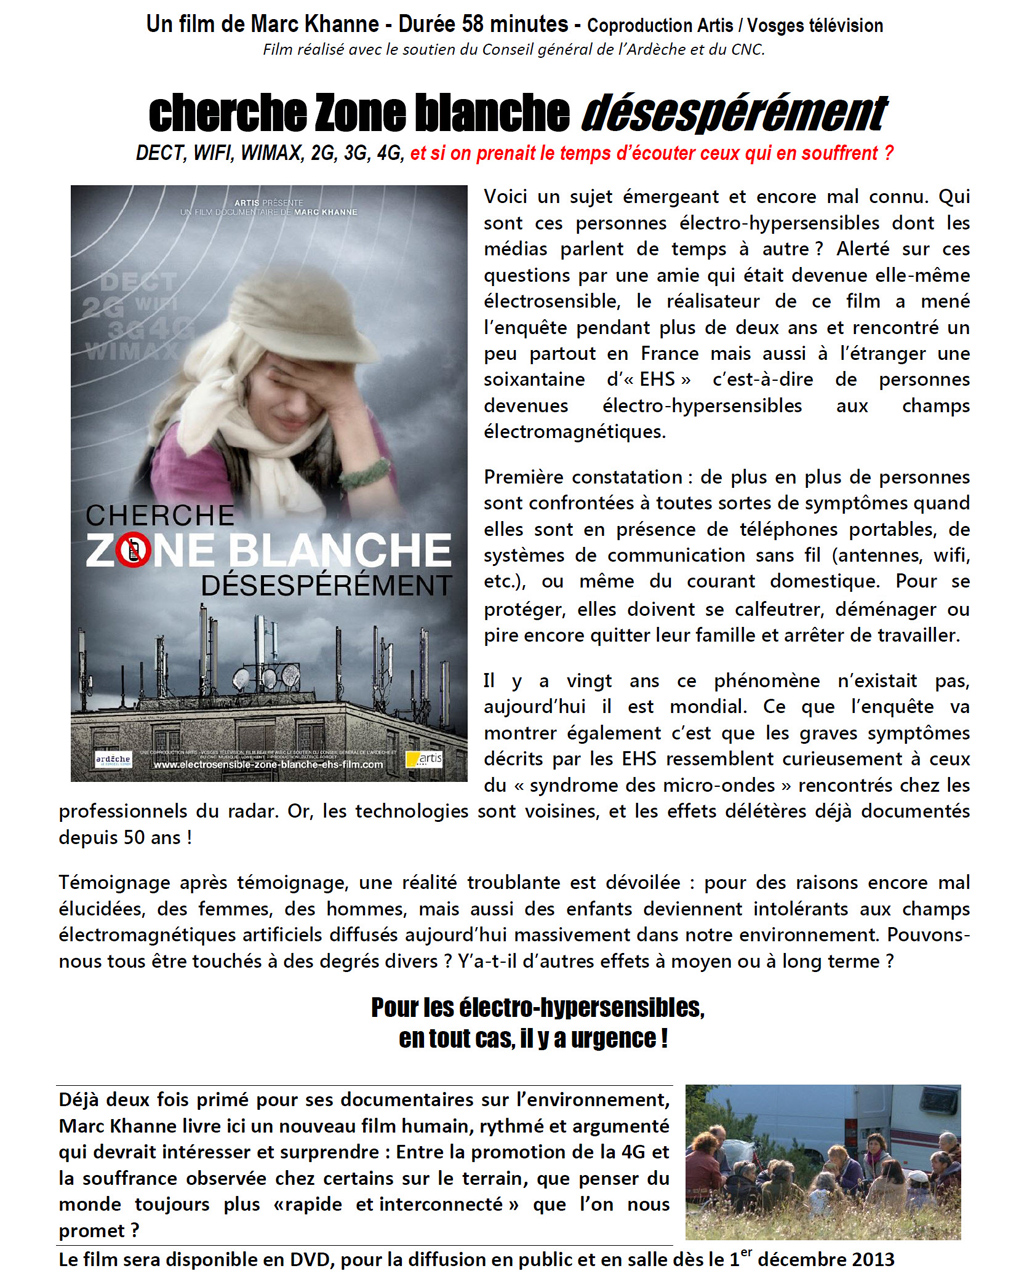 Cherche_Zone_Blanche_Desesperement_Realisateur_Marc_Khanne_flyer_presentation_1024.jpg